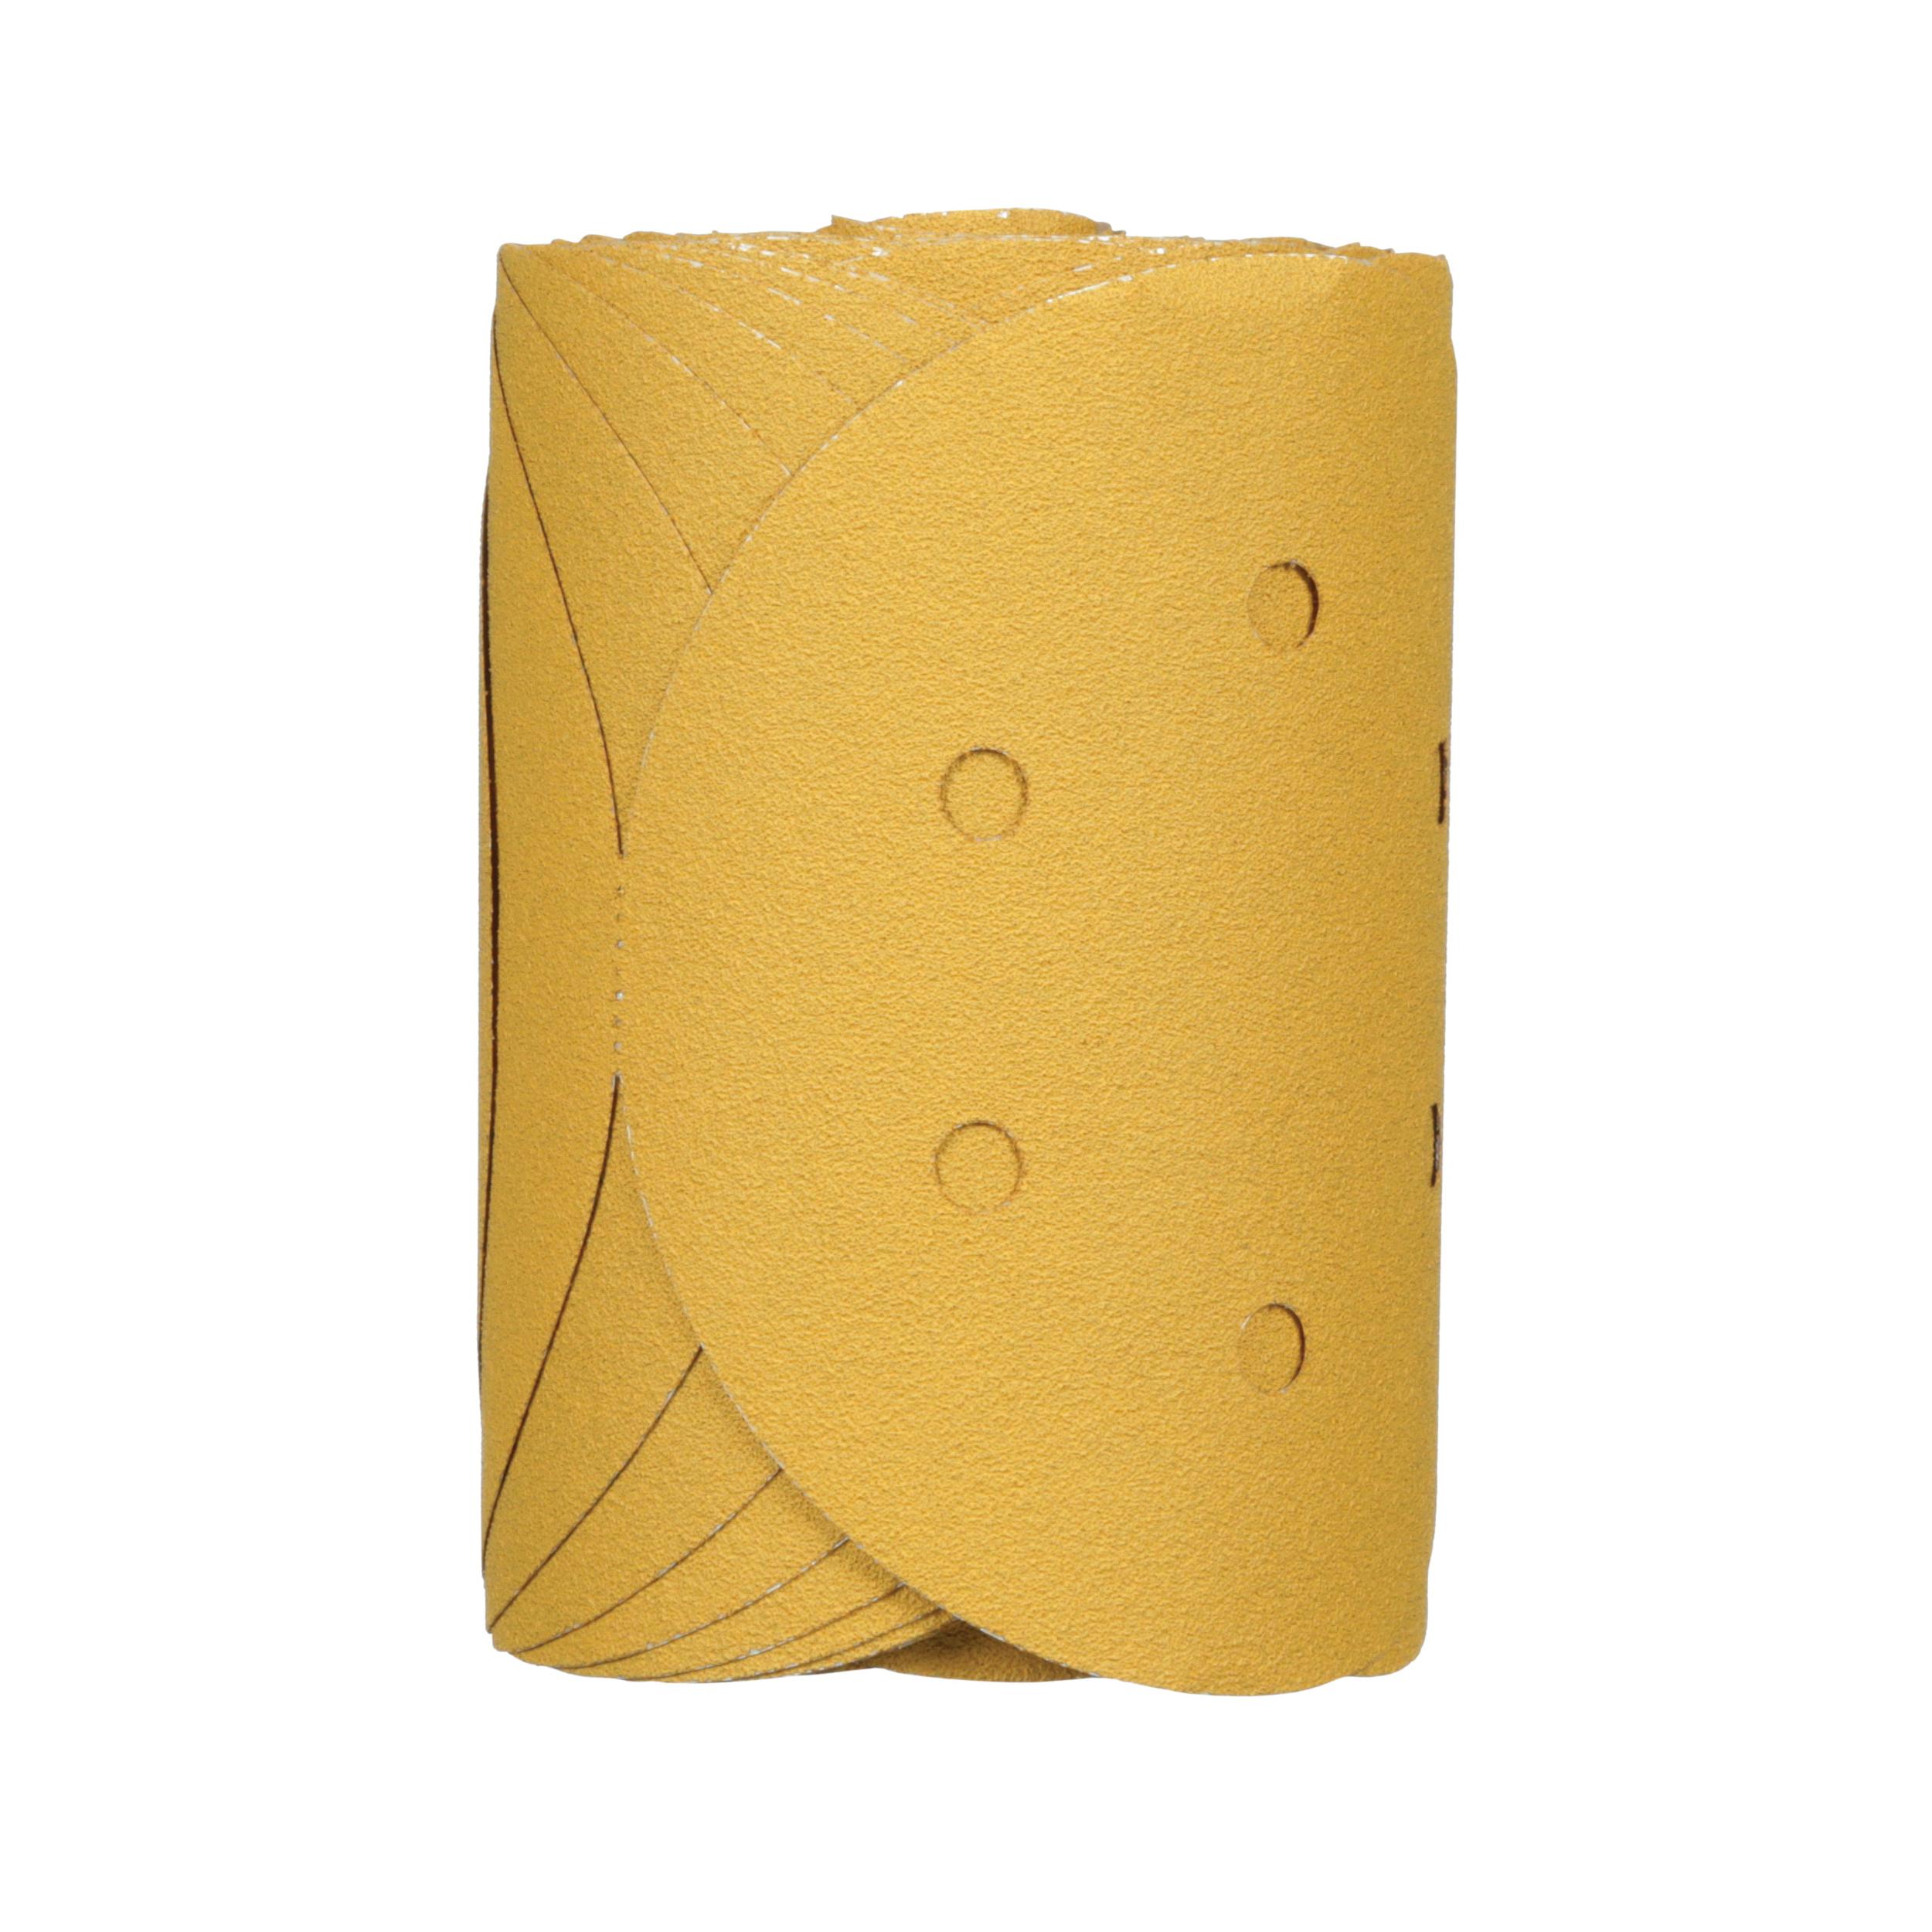 3M™ Stikit™ 051131-01383 Open Coated PSA Abrasive Disc Roll, 6 in Dia Disc, P80 Grit, Coarse Grade, Aluminum Oxide Abrasive, Film Backing